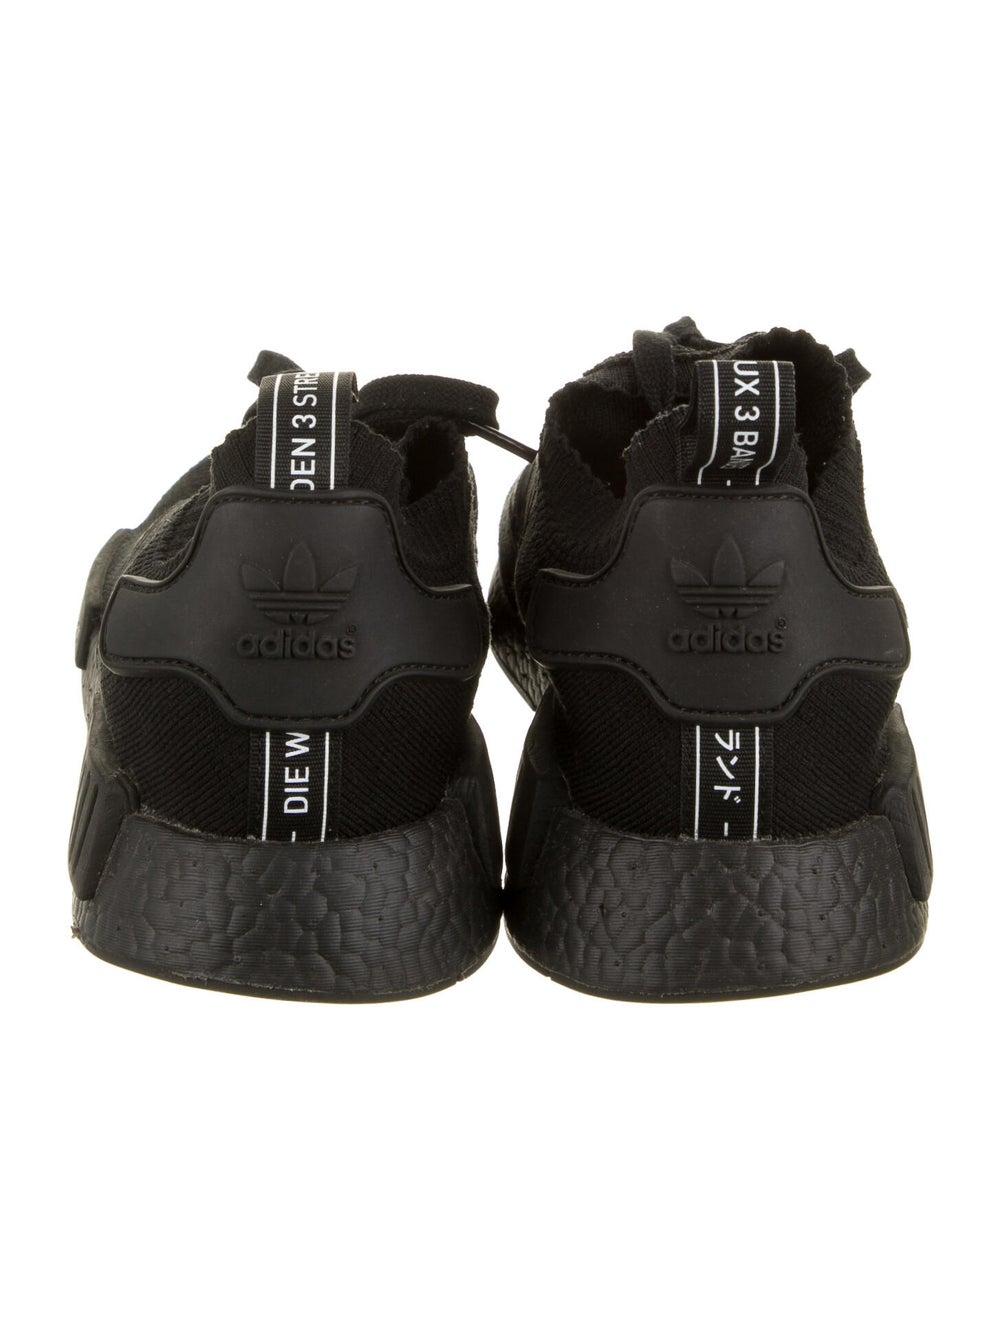 Adidas Athletic Sneakers Black - image 4